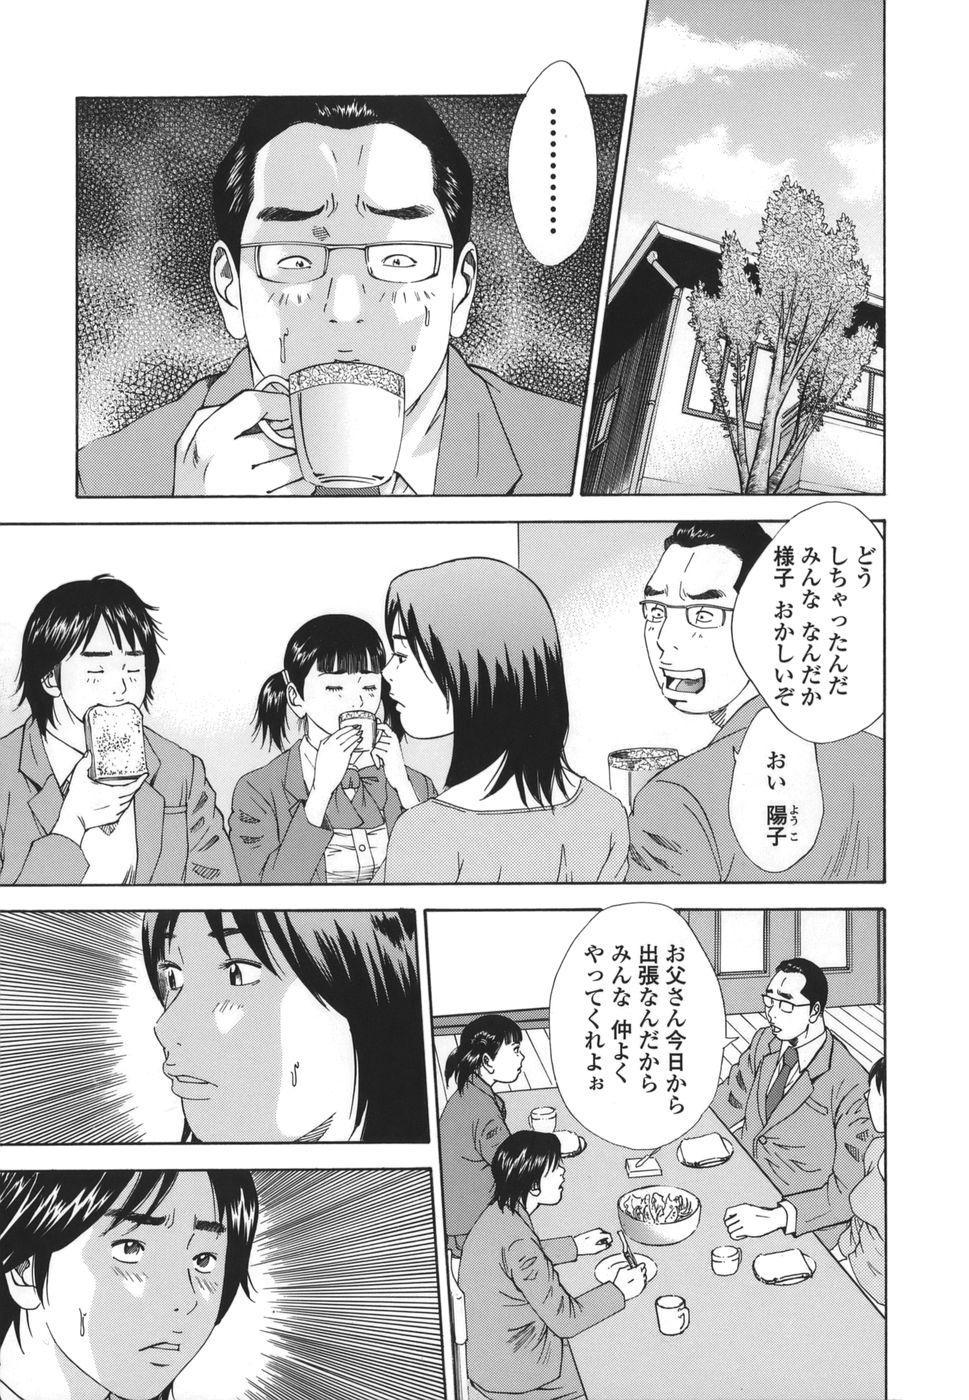 Kinshin Goukan - Near Relation Rapes 90